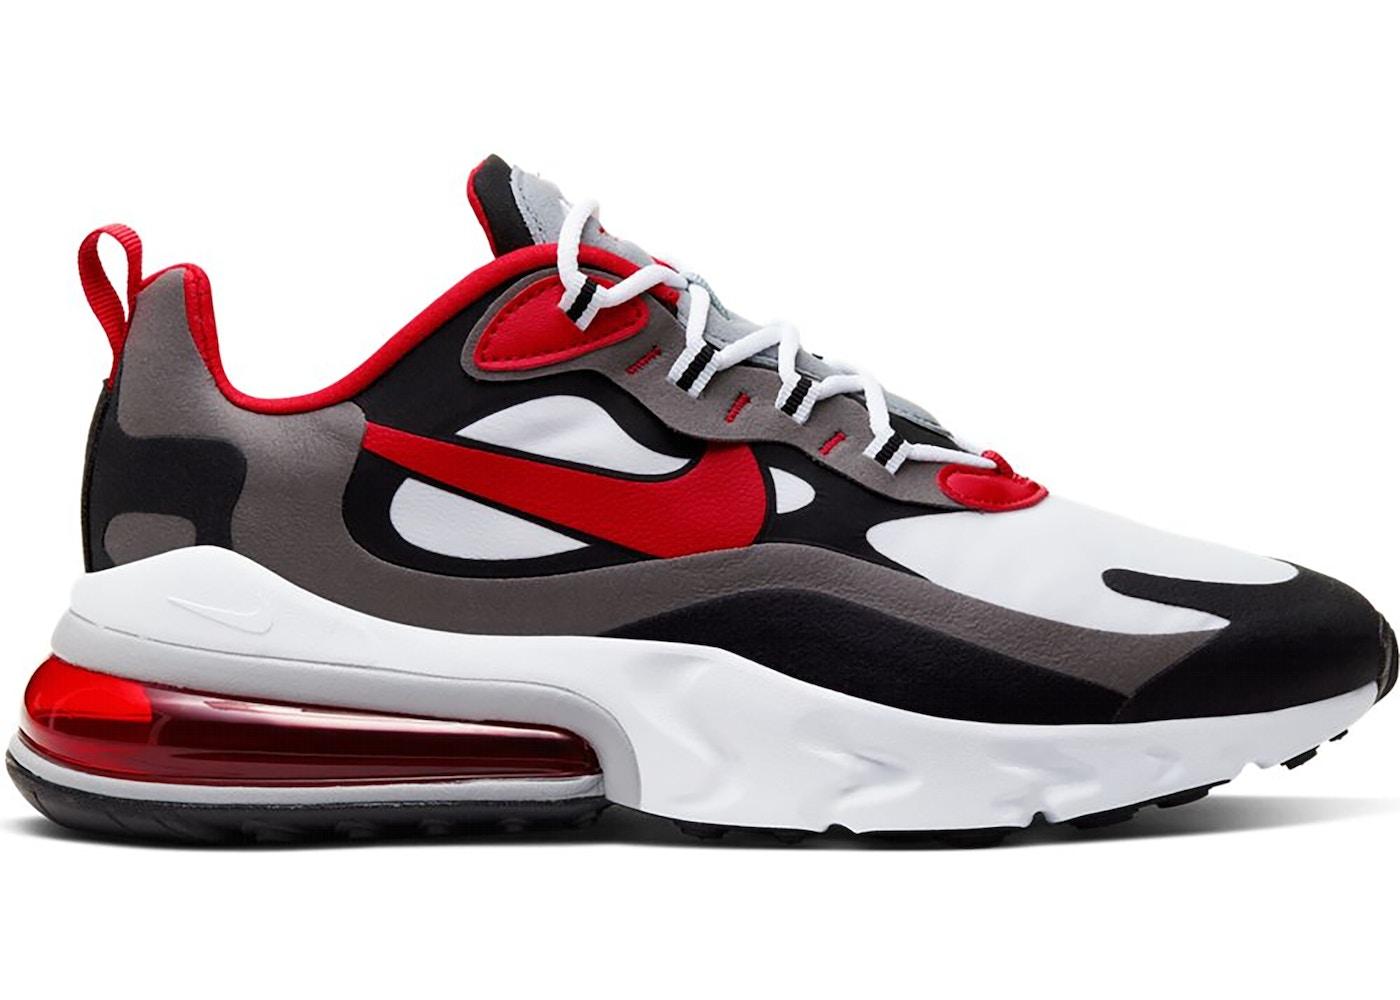 Nike Air Max 270 React Black Iron Grey University Red - CI3866-002